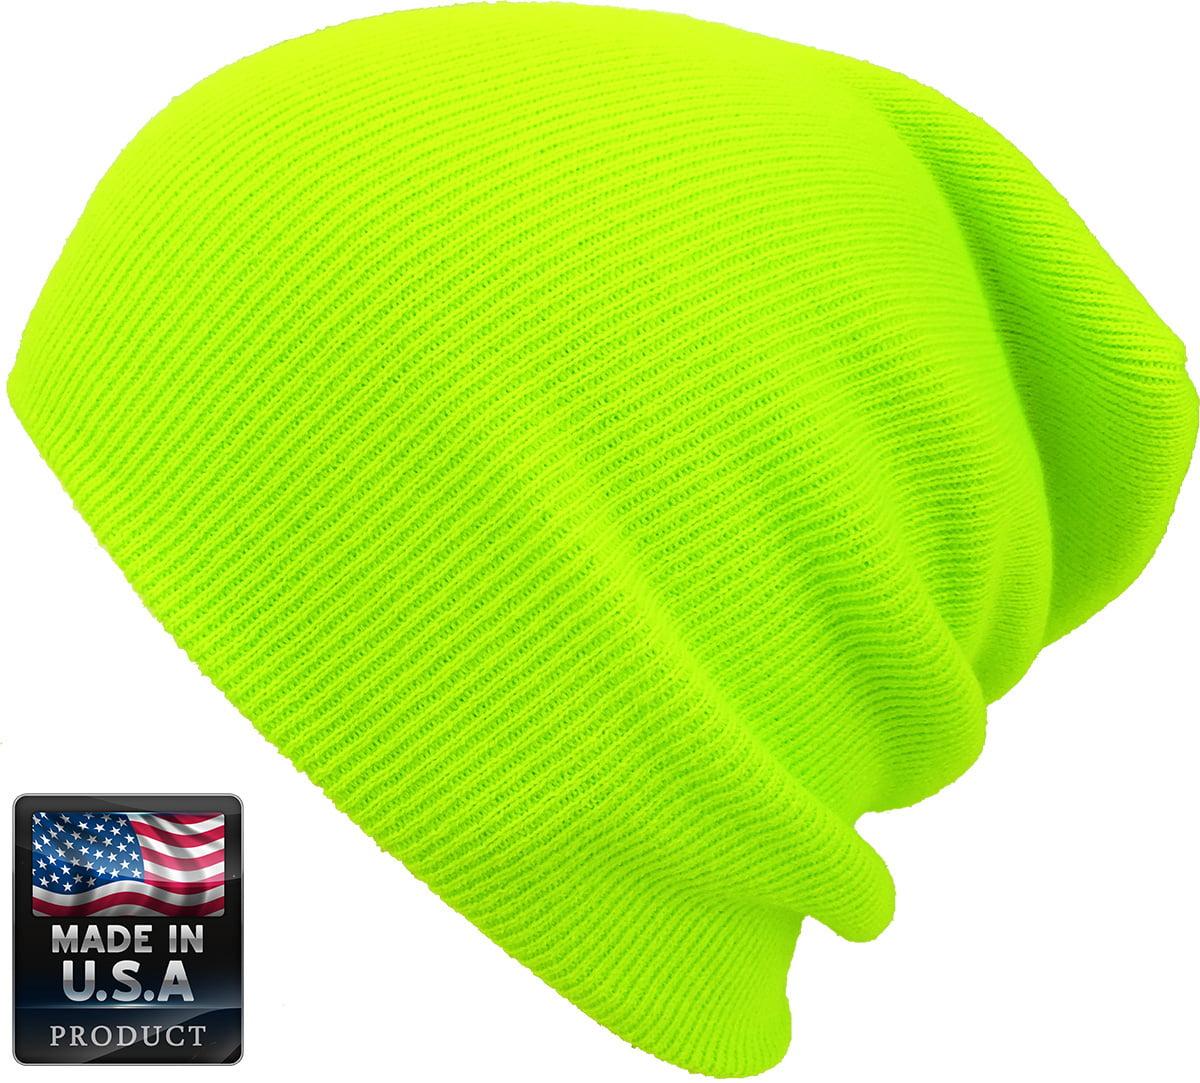 KBETHOS - Plain Skully High Quality Made in USA Winter Beanie Hat - Walmart .com f4914e541f7